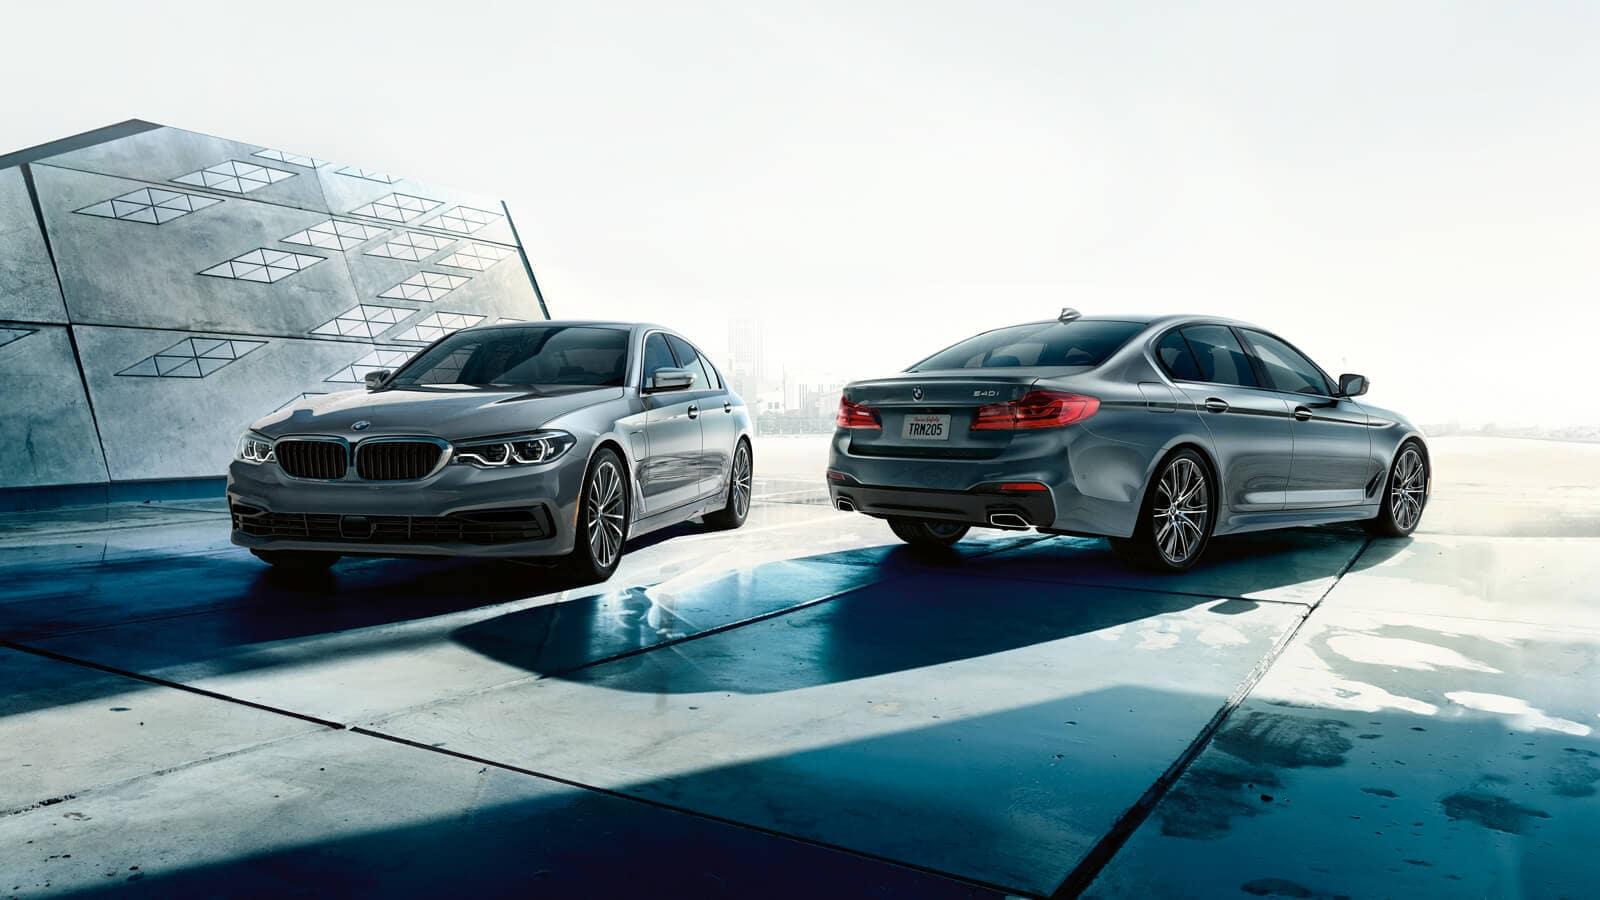 BMW 5 Series Guam